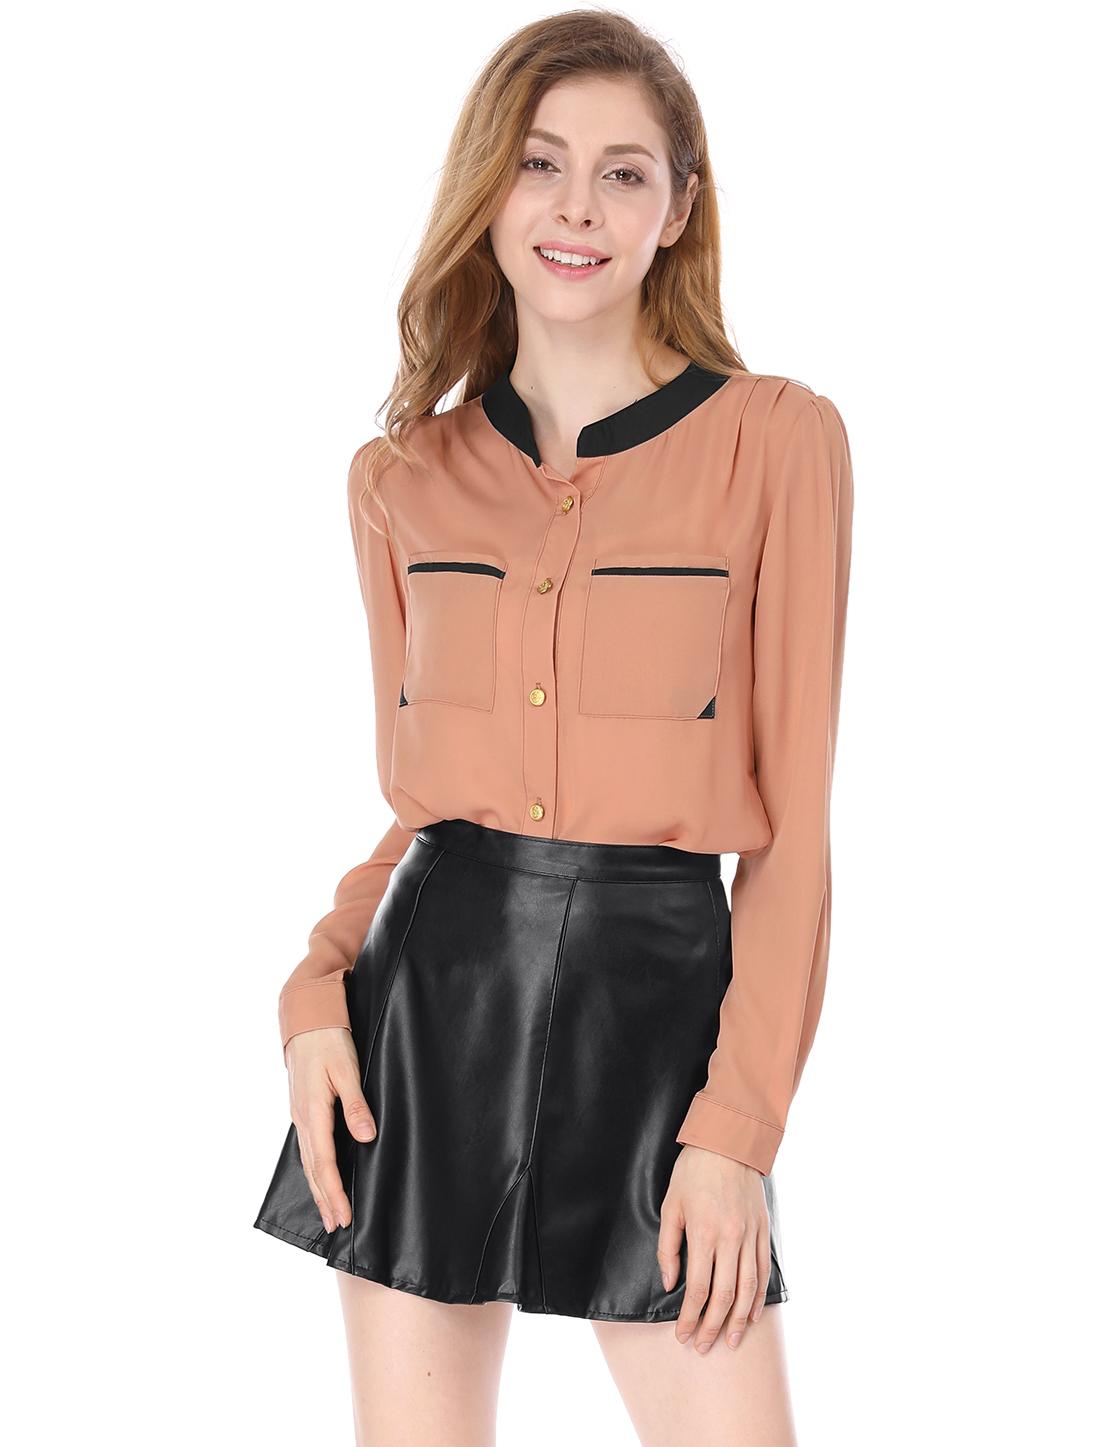 Slim Fit Round Hem Single Breasted Chiffon Shirt for Lady Salmon Pink XS